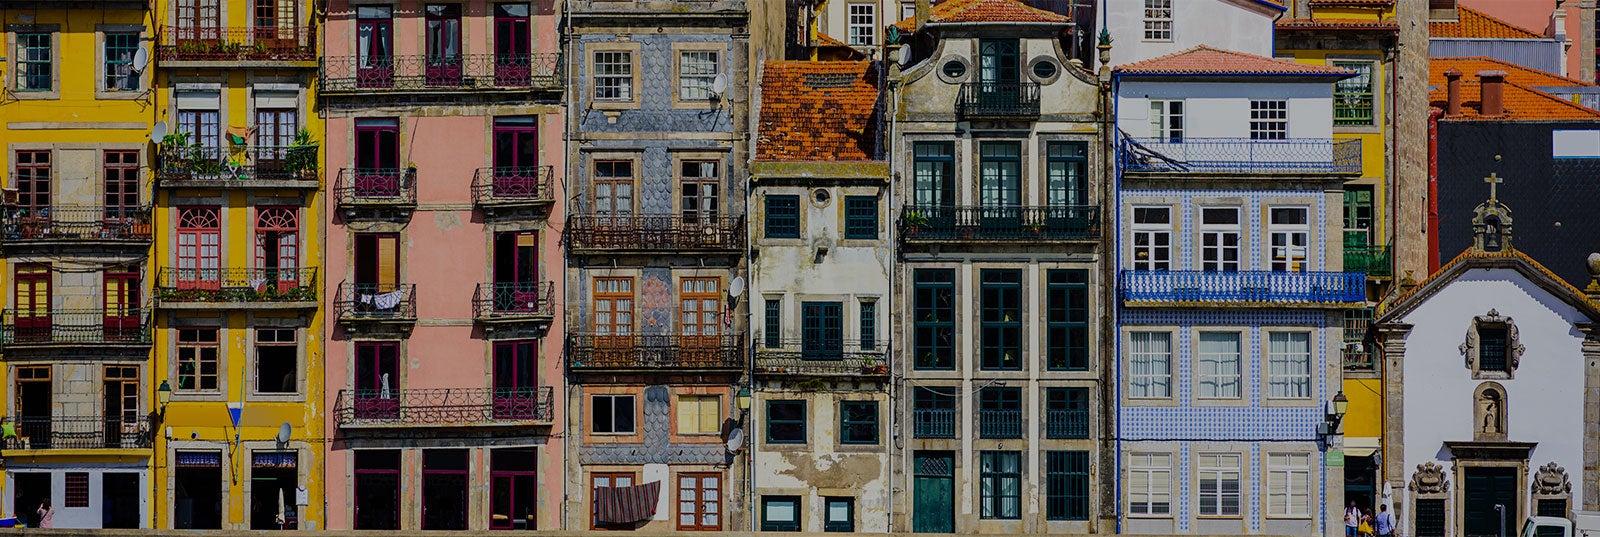 Guía turística de Porto